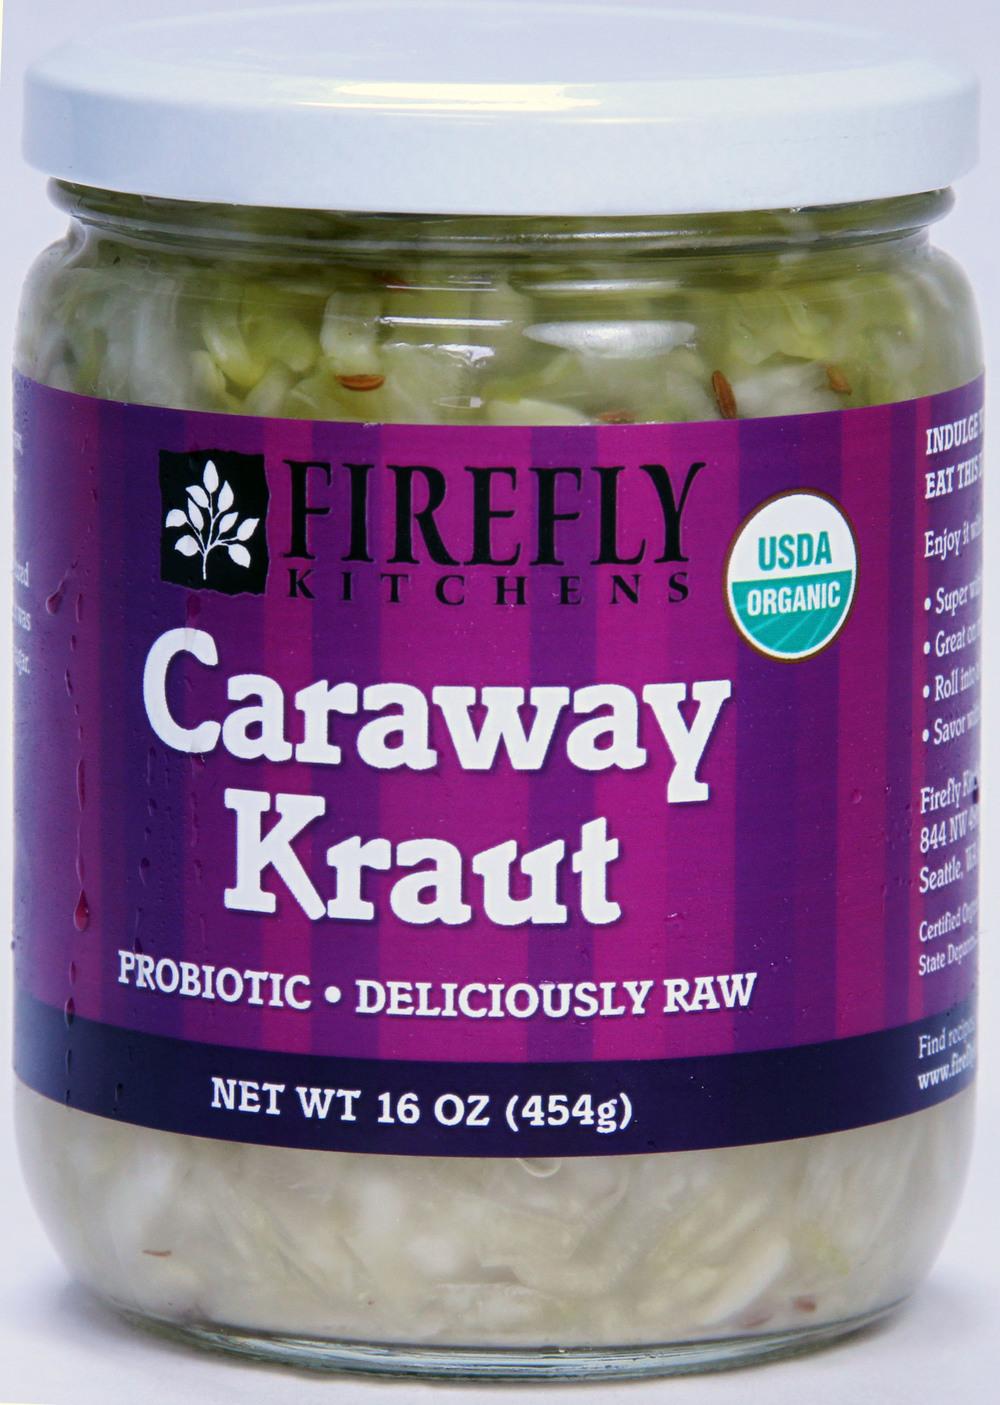 Caraway Kraut.jpg